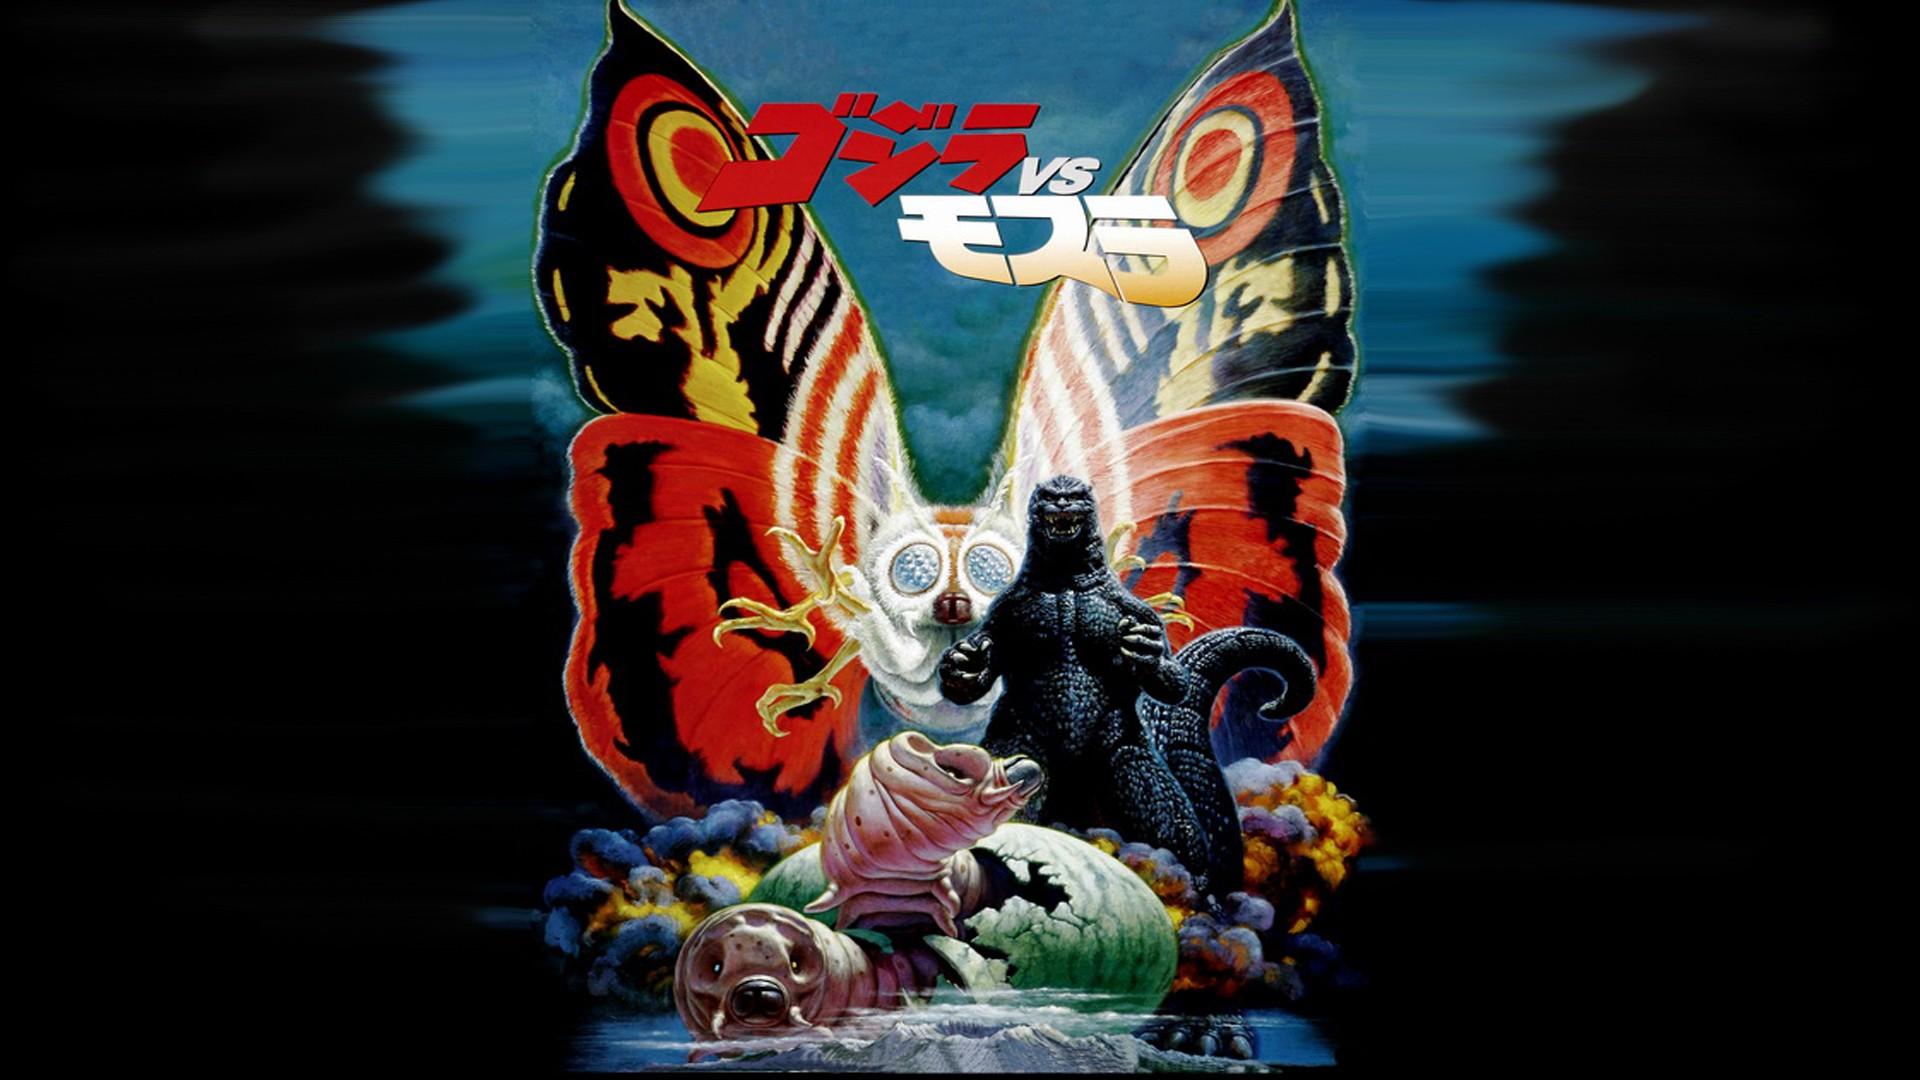 Godzilla Vs Mothra 14